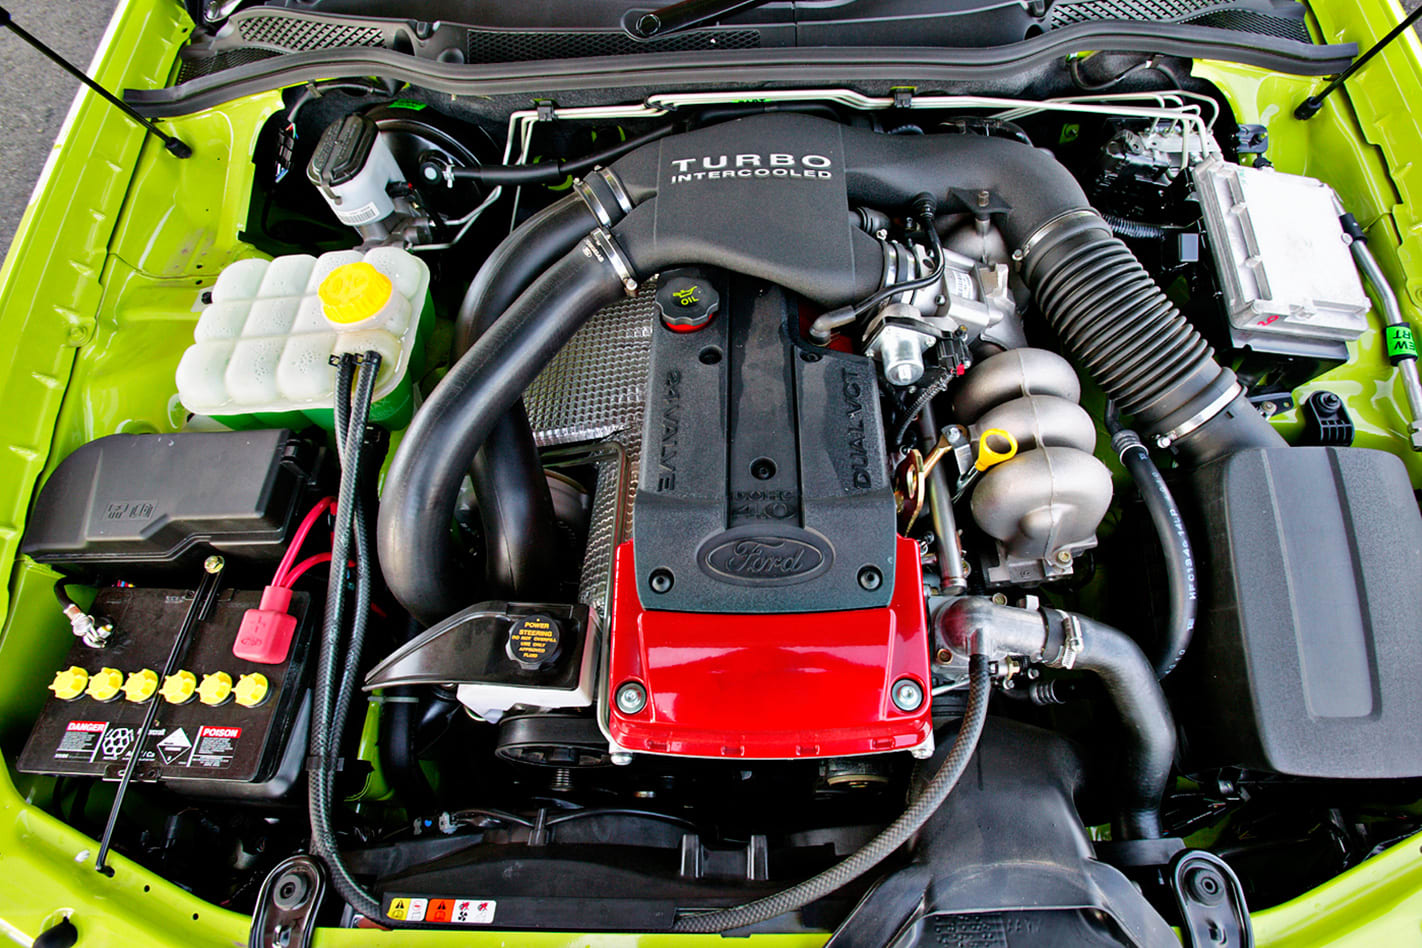 BF-Ford-XR6-Turbo-Auto-engine.jpg